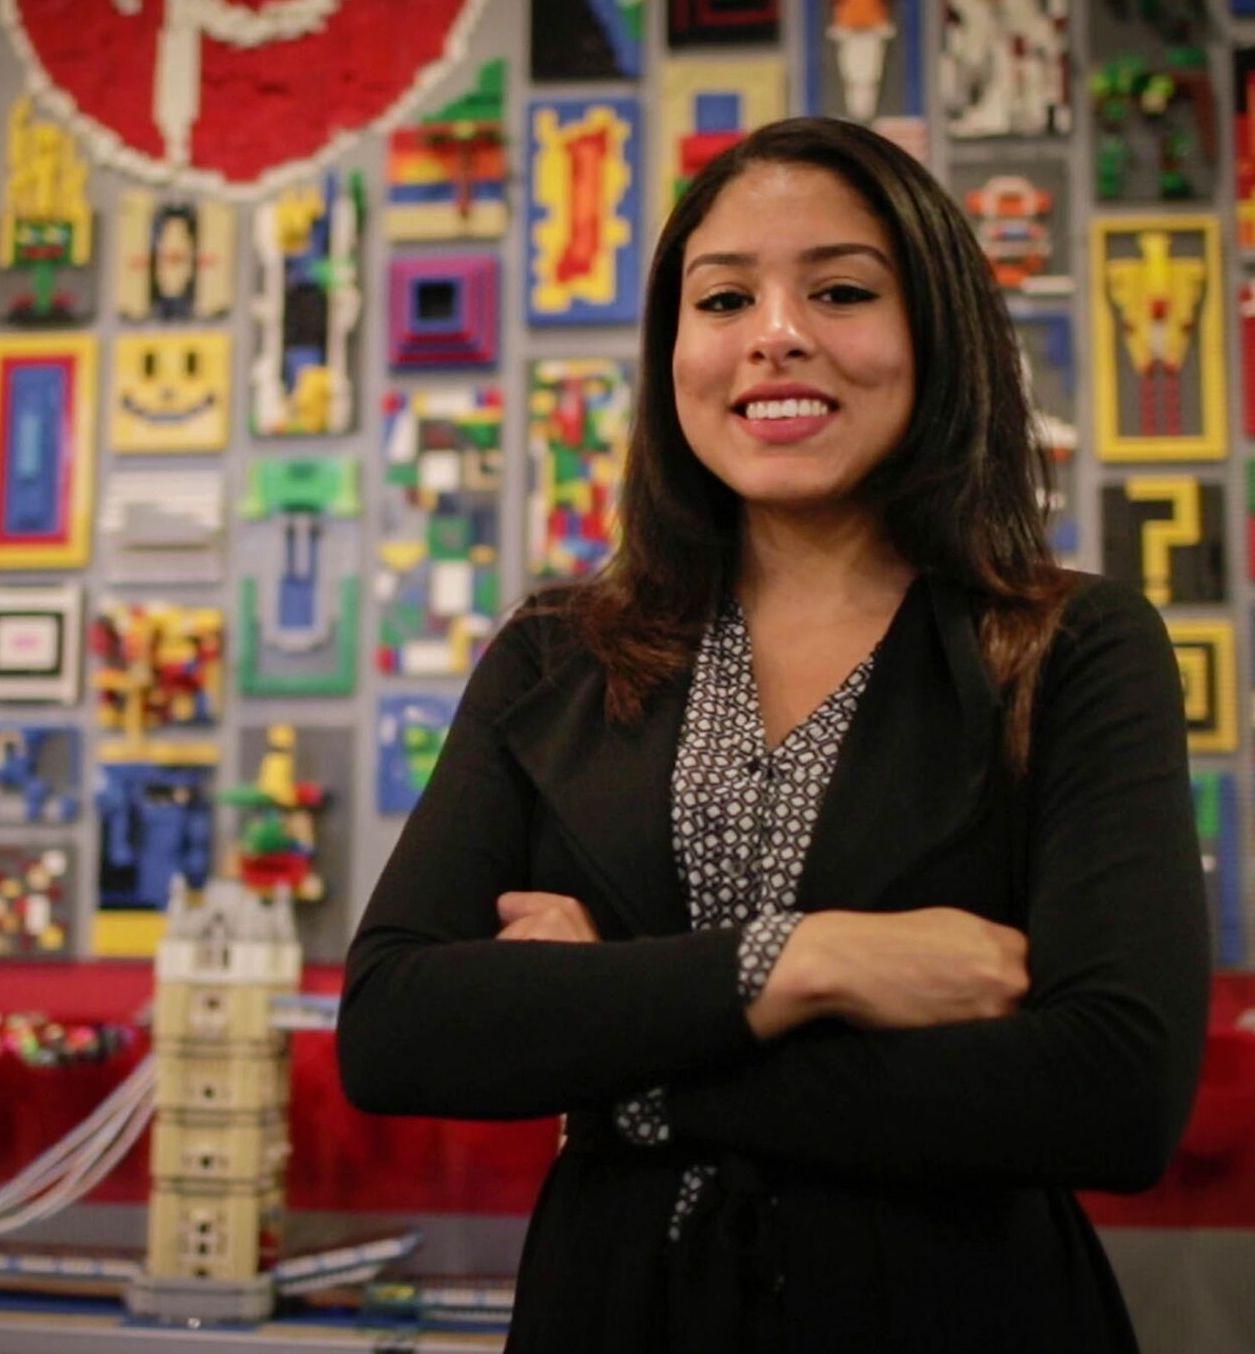 Madelyn Tavarez ● Software Engineer ● Pinterest